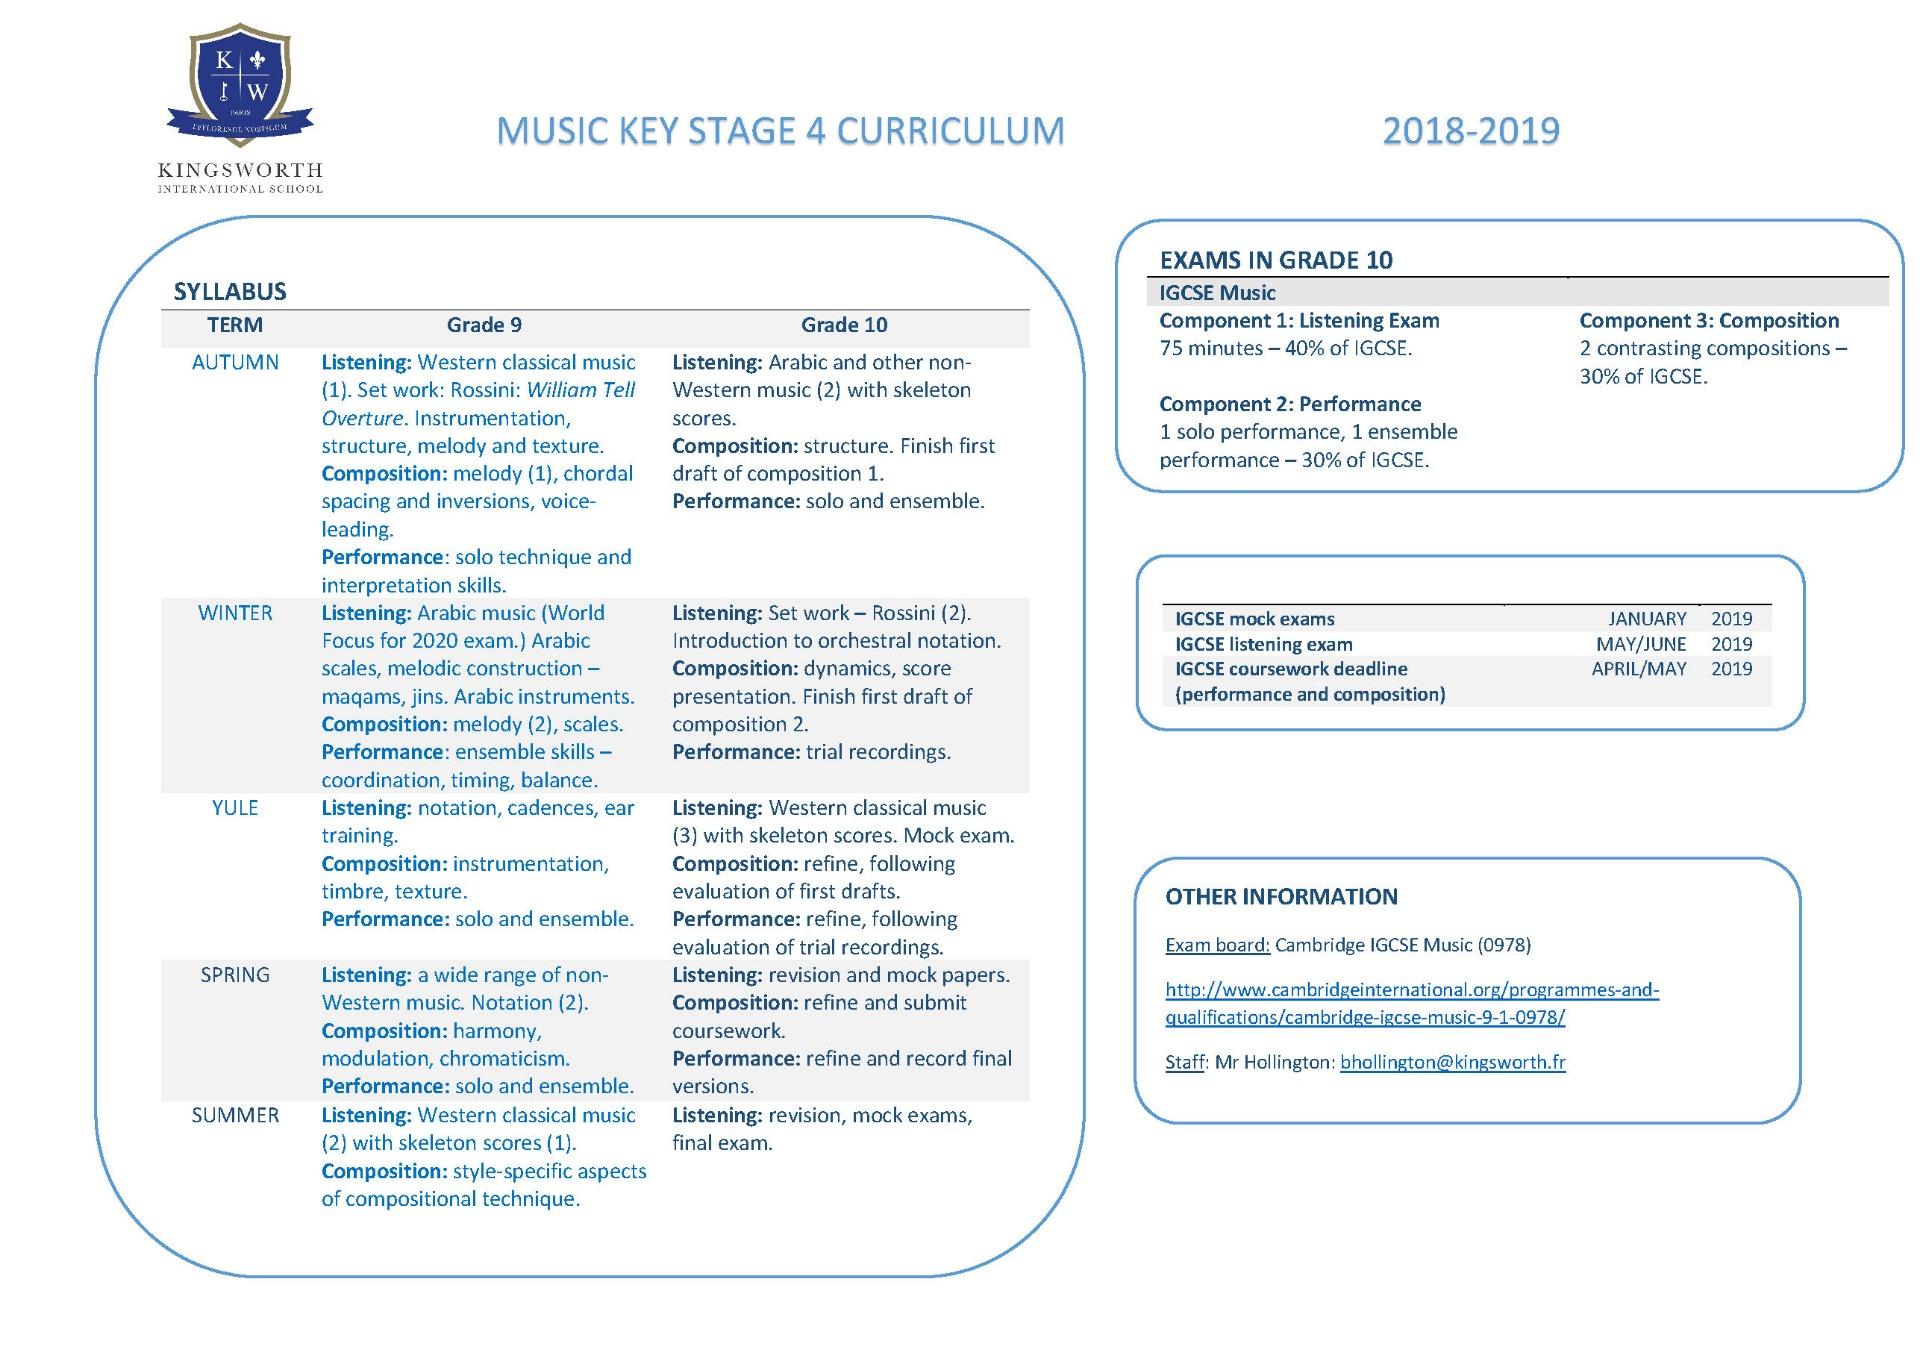 Cambridge Igcse Timetable 2019